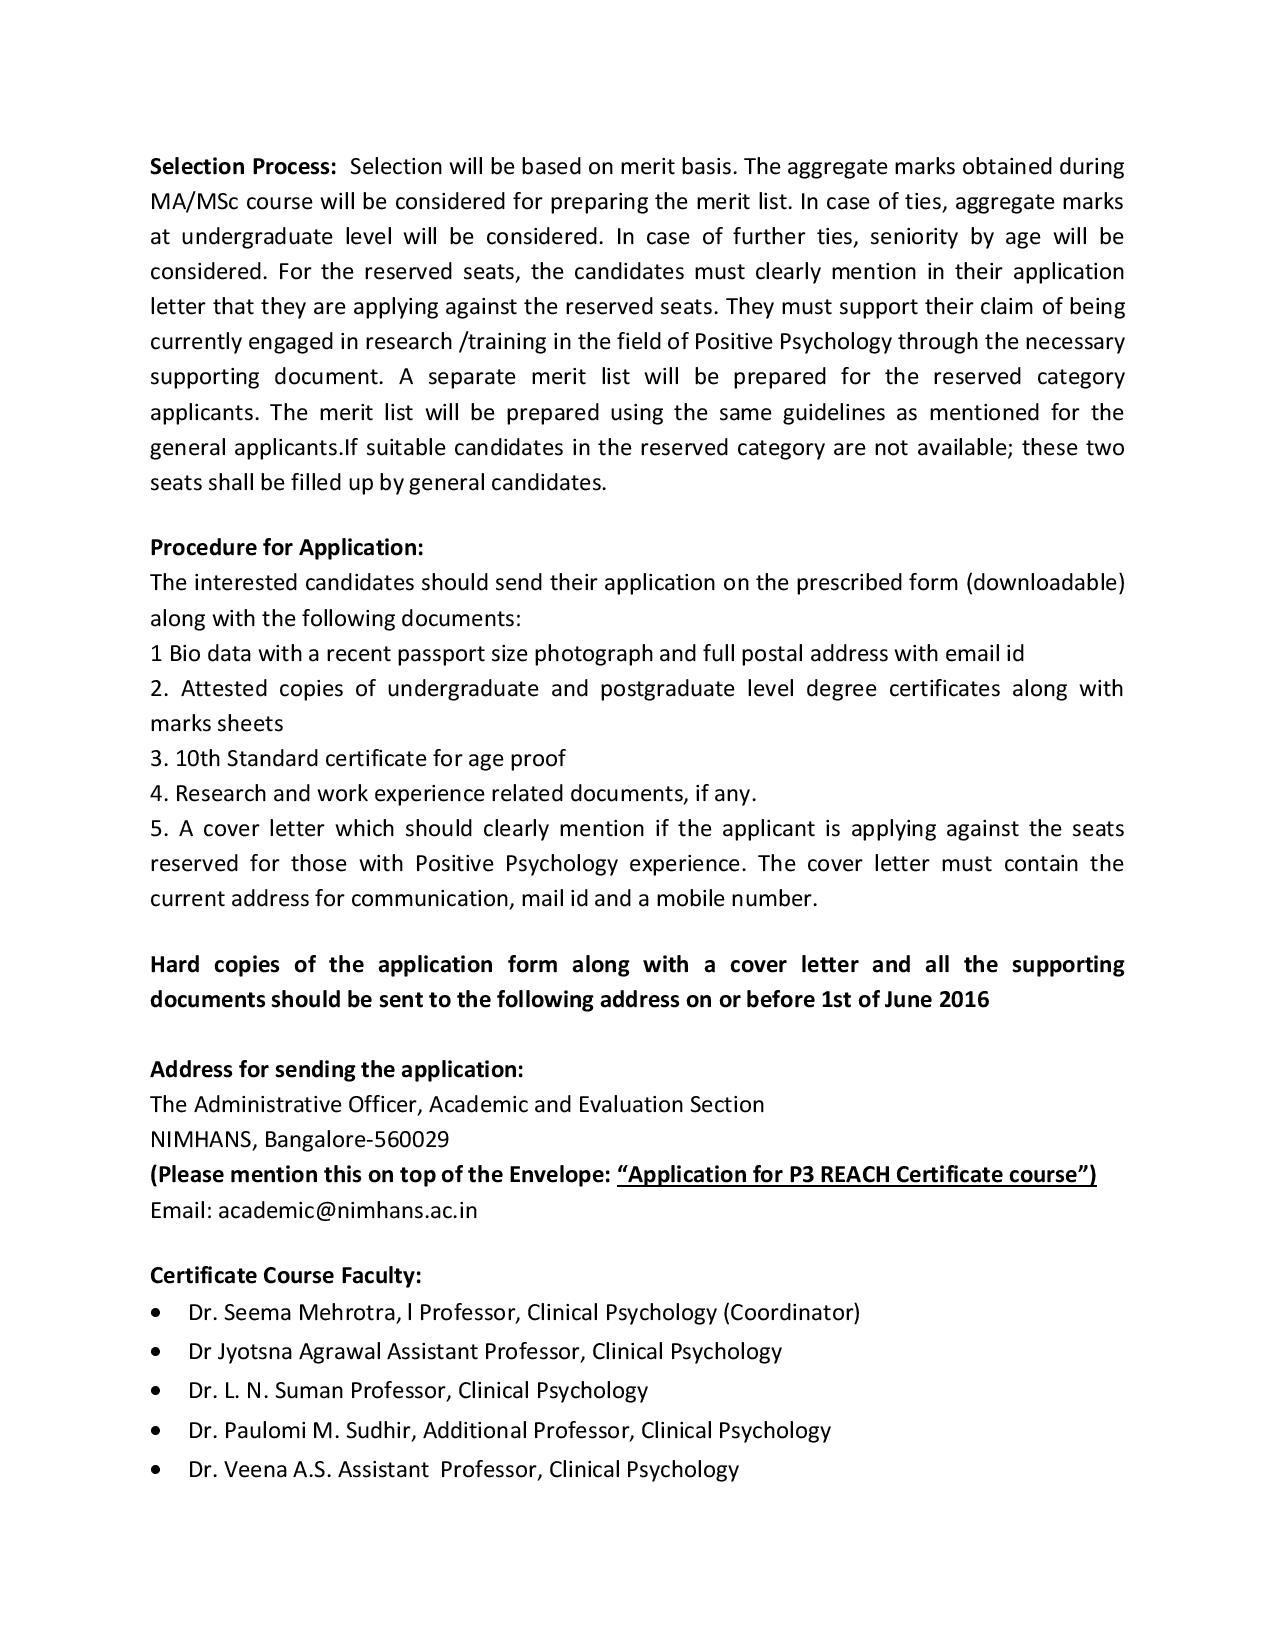 P3_REACH_ANNOUNCEMENT 2016-page-002